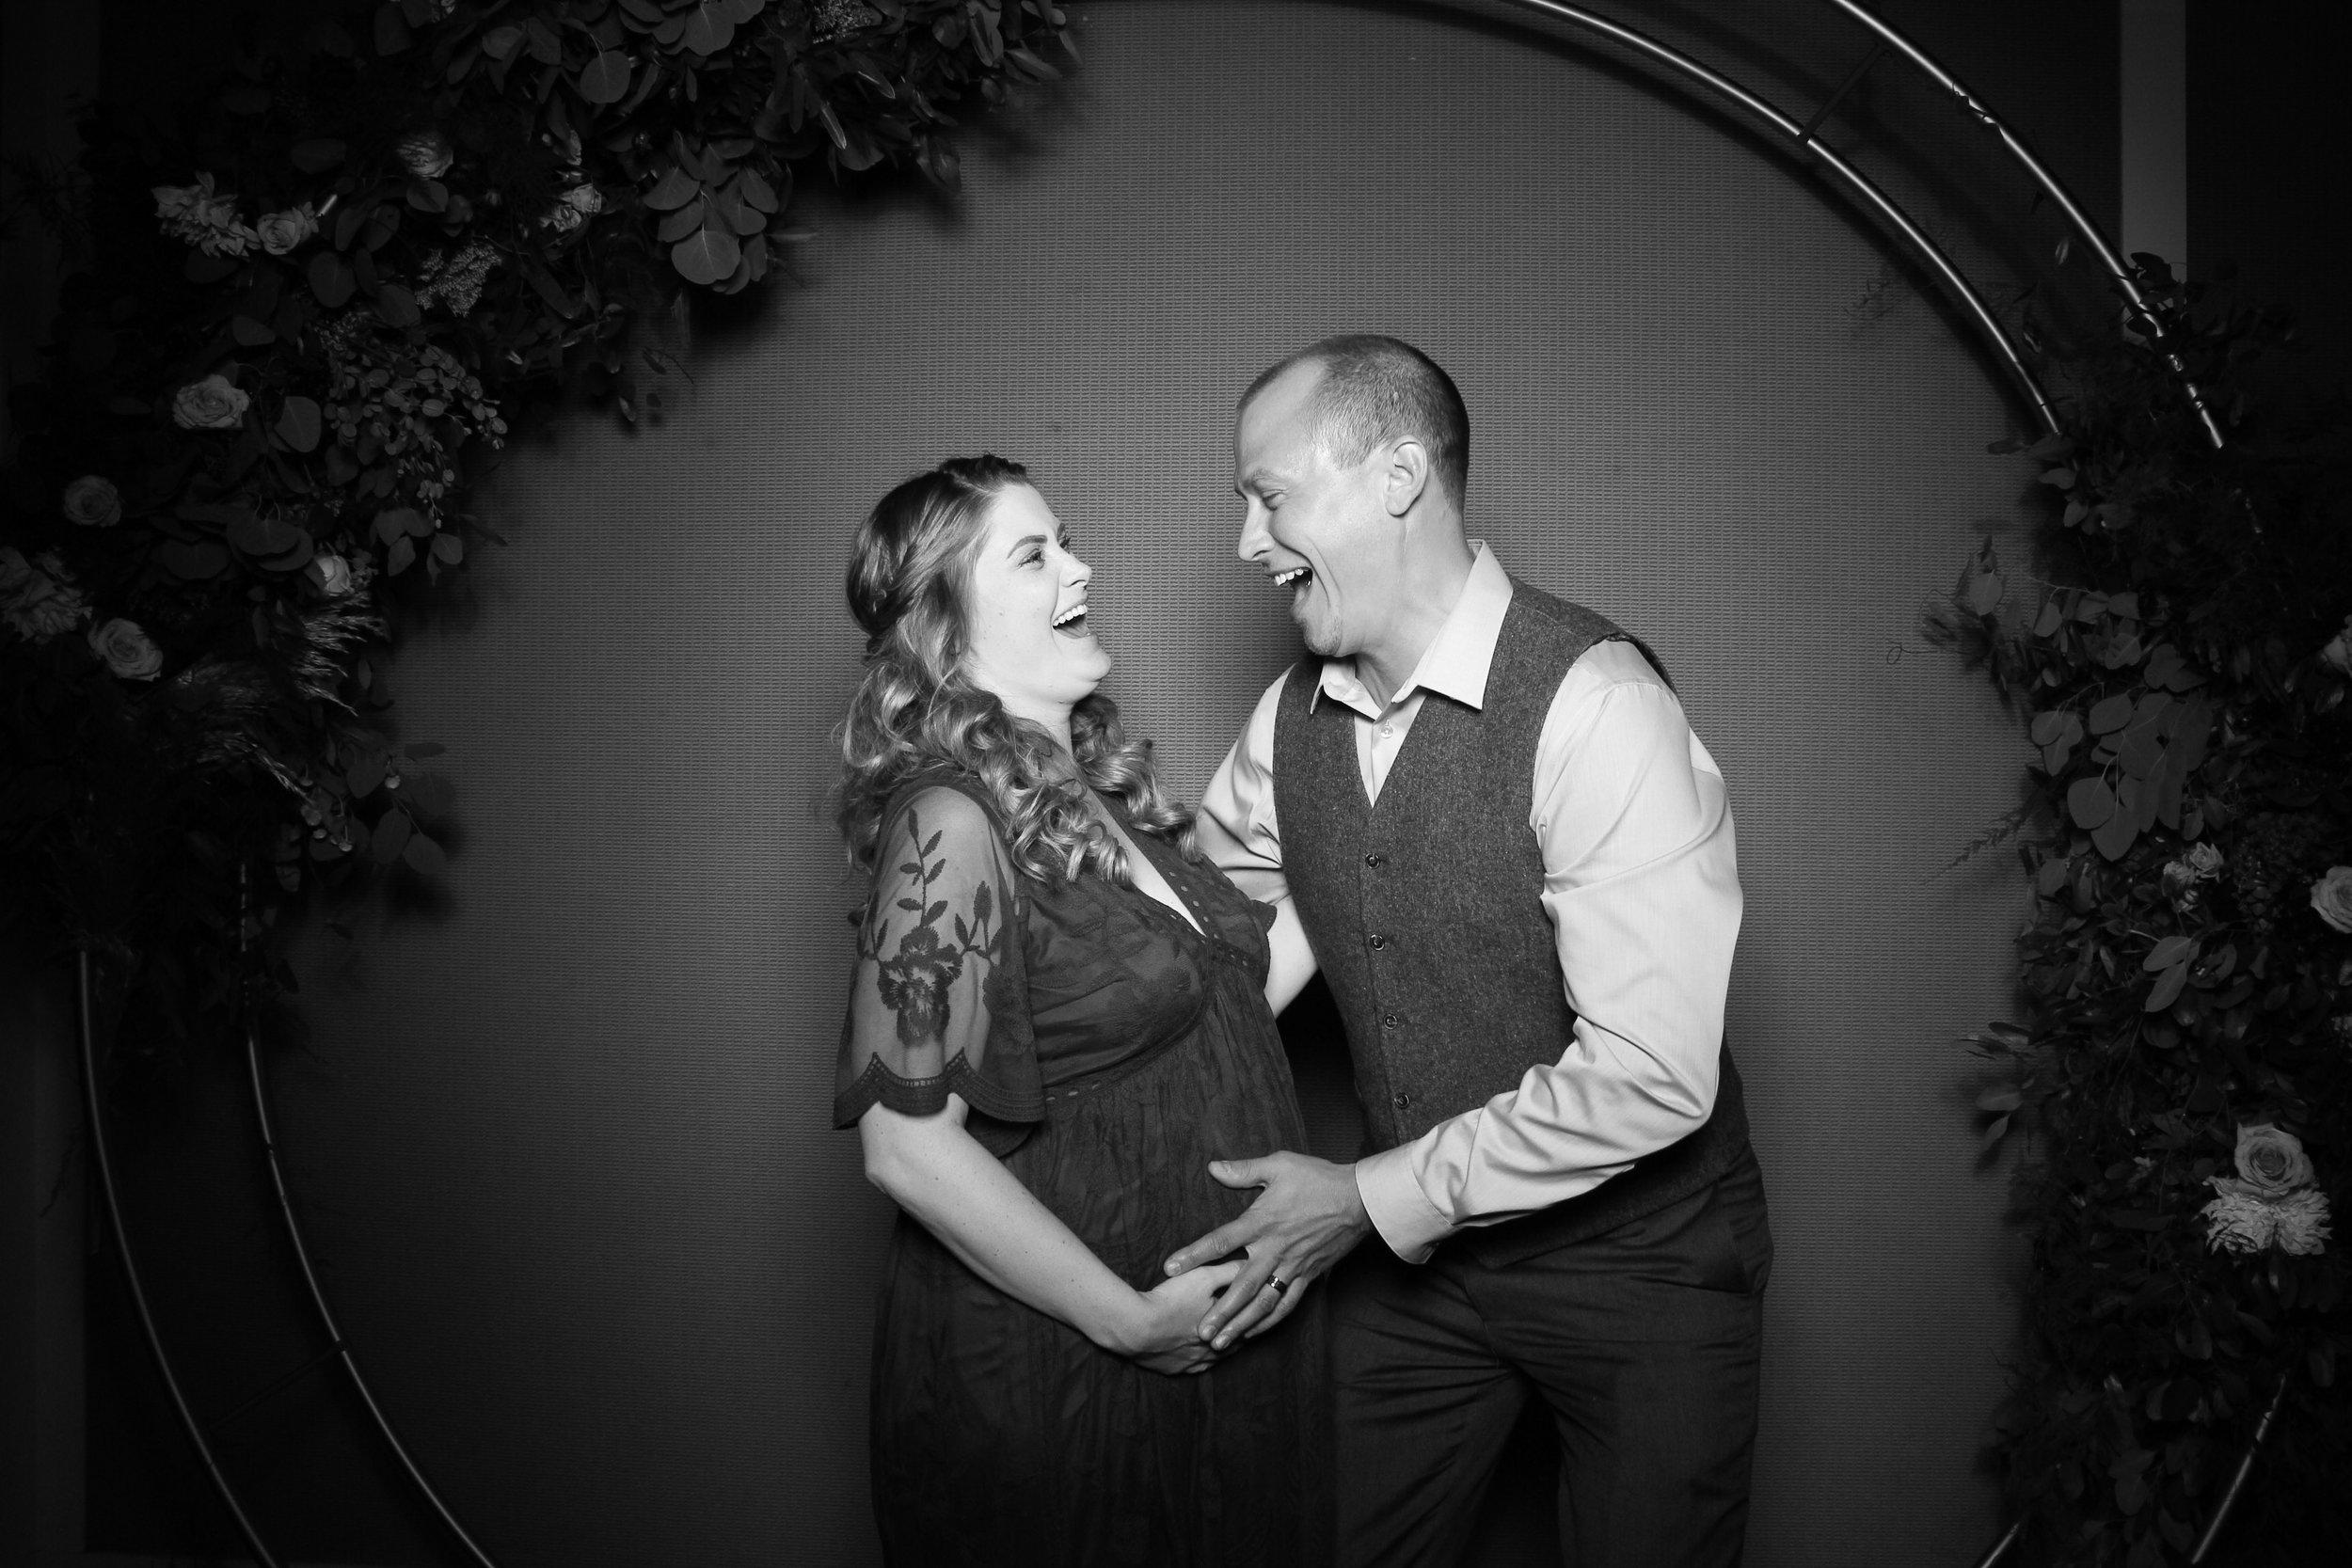 Metropolis_Ballroom_Wedding_Arlington_Heights_Photo_Booth_17.jpg